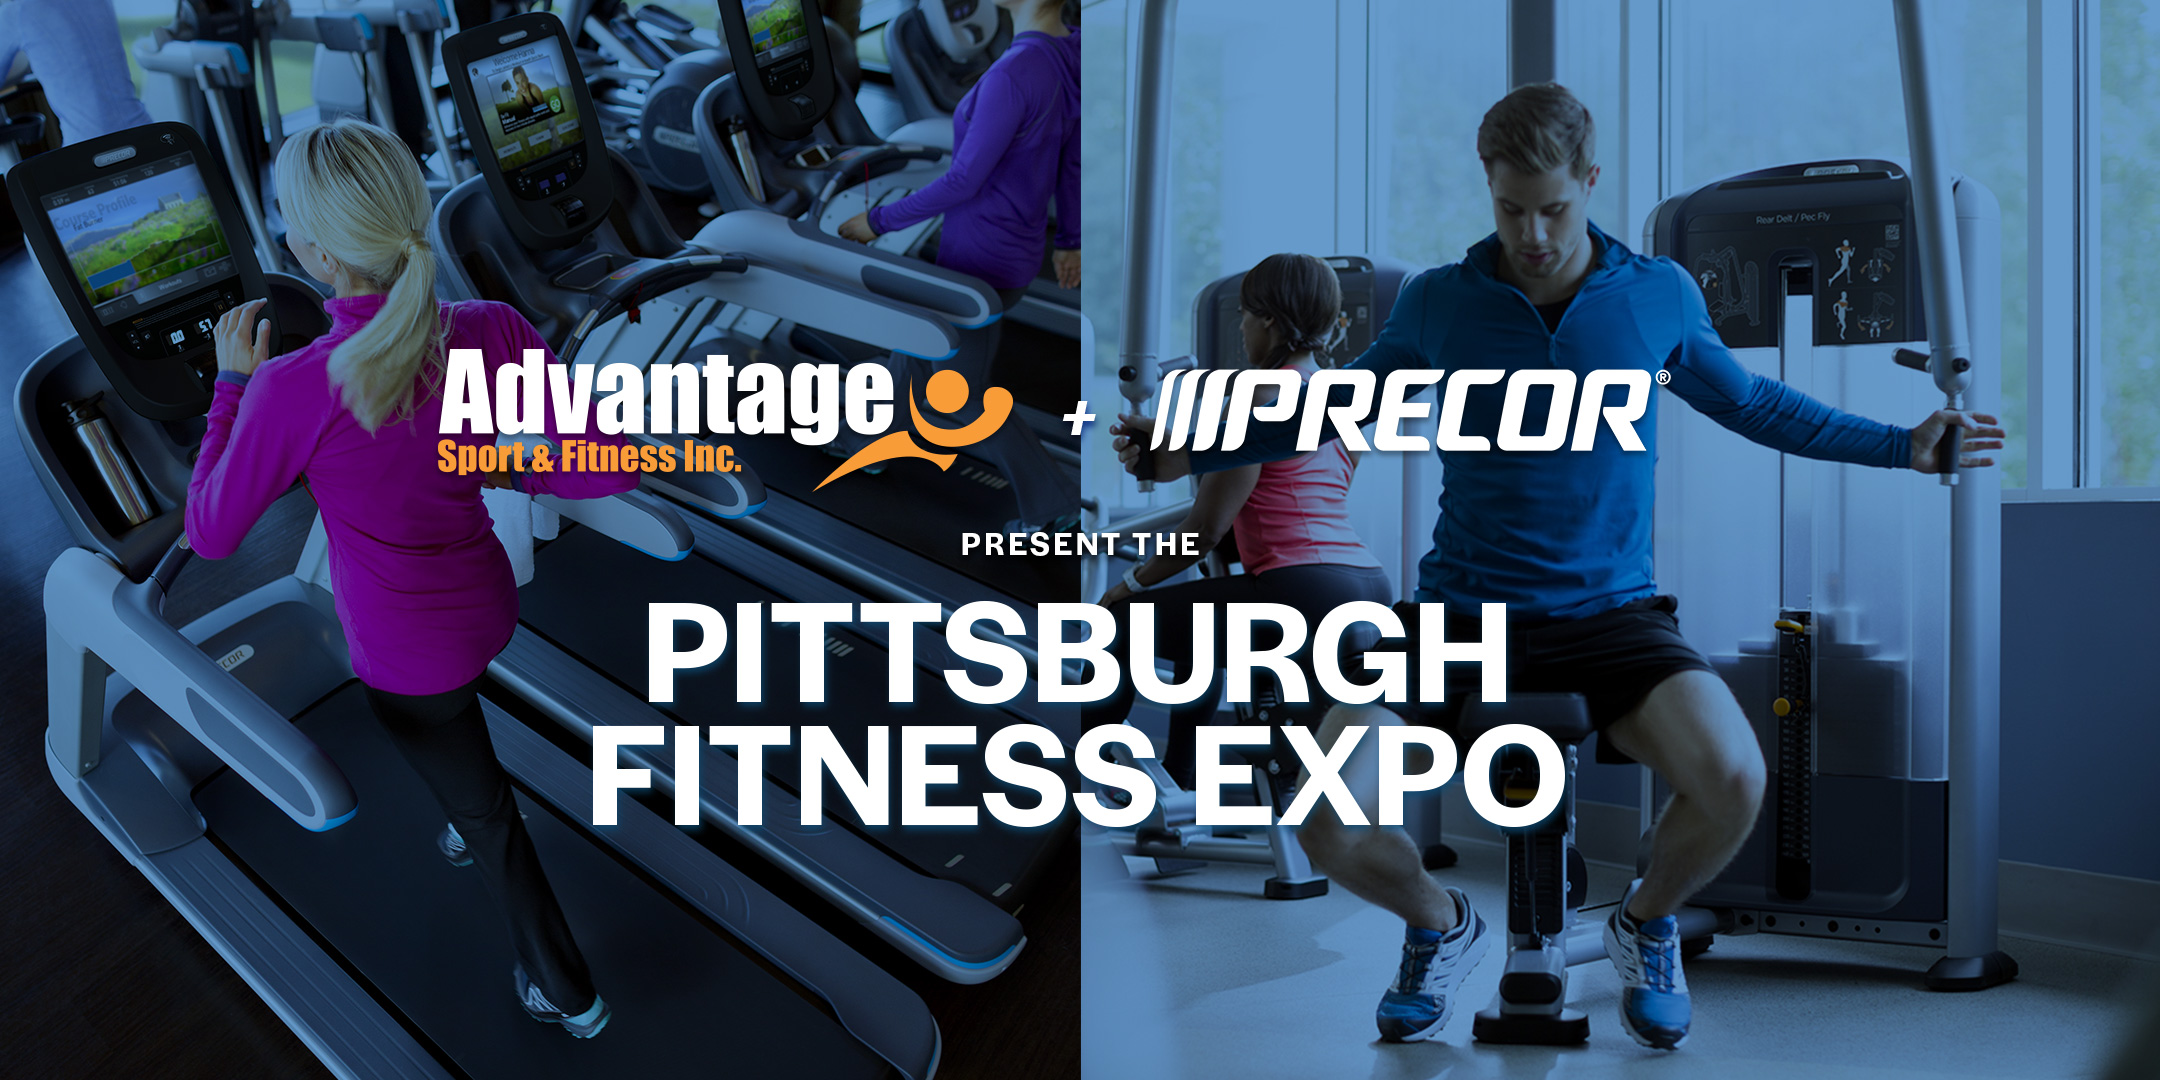 Pittsburgh-Fitness-Expo-eventbrite-image.jpg